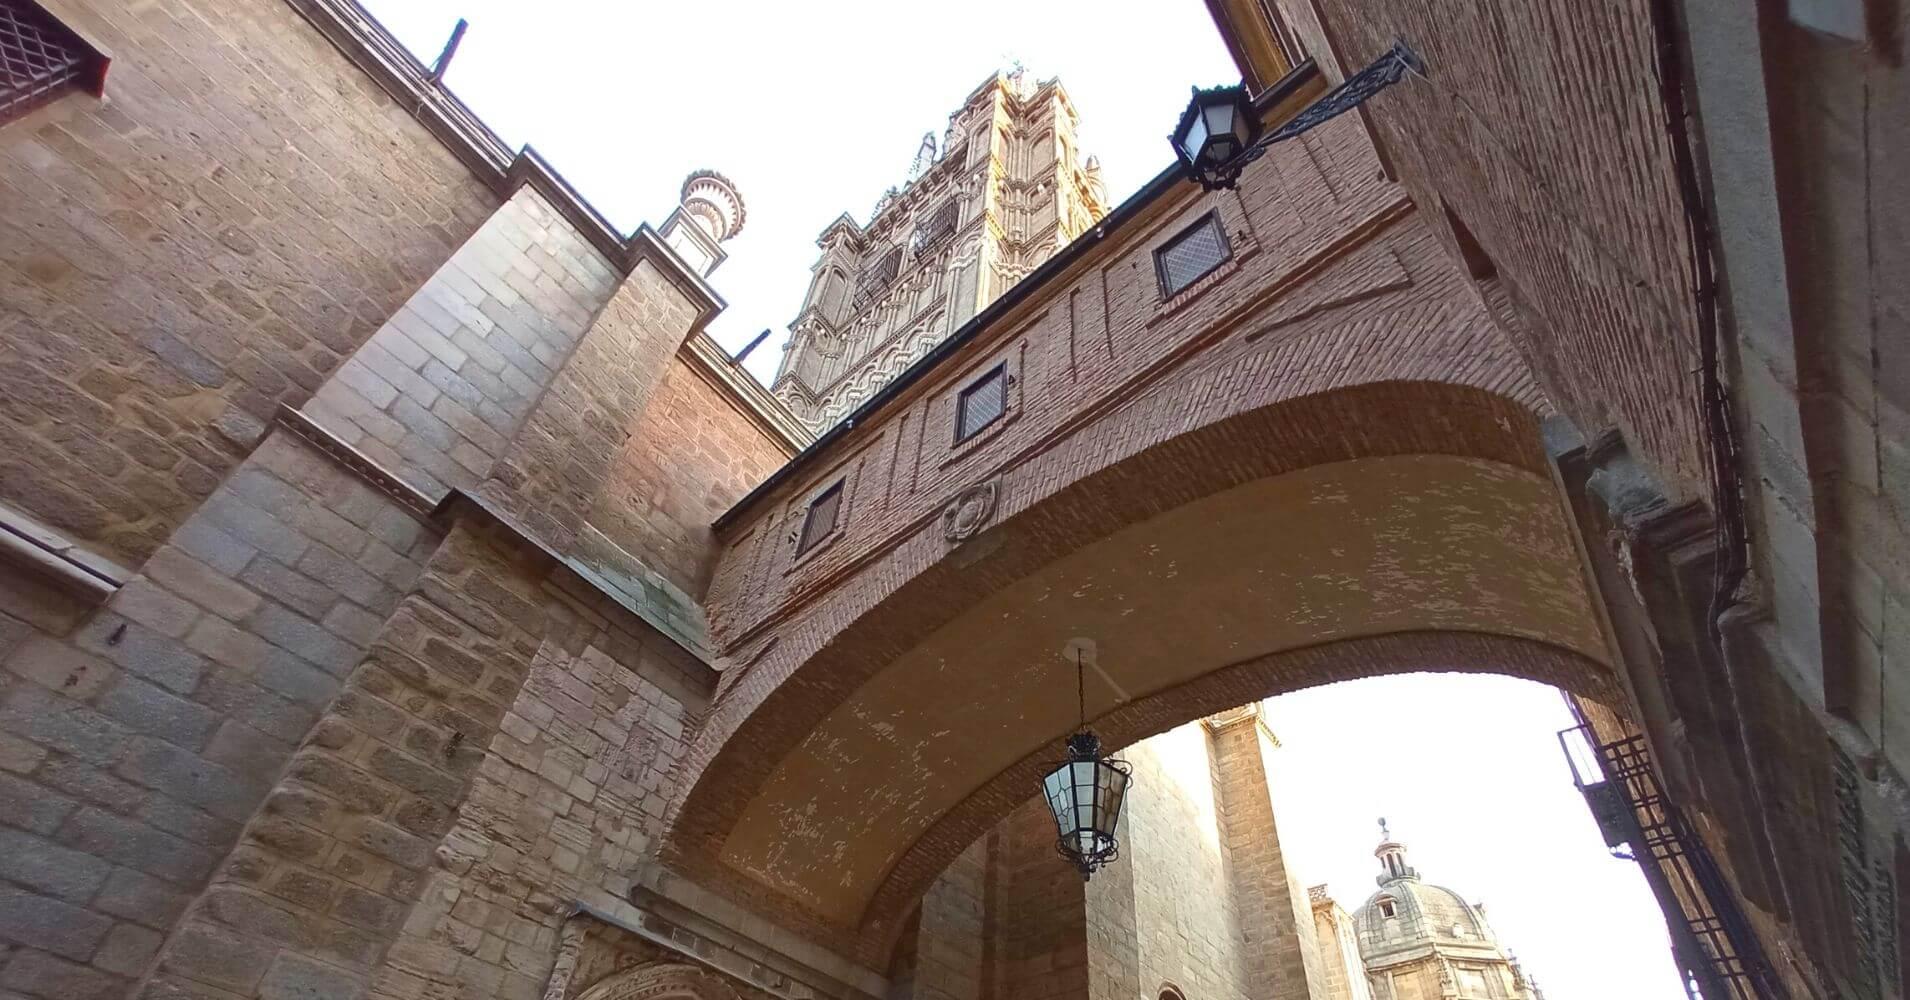 Pasadizo de la Catedral de Toledo al Palacio Arzobispal. Toledo, Castilla La Mancha.